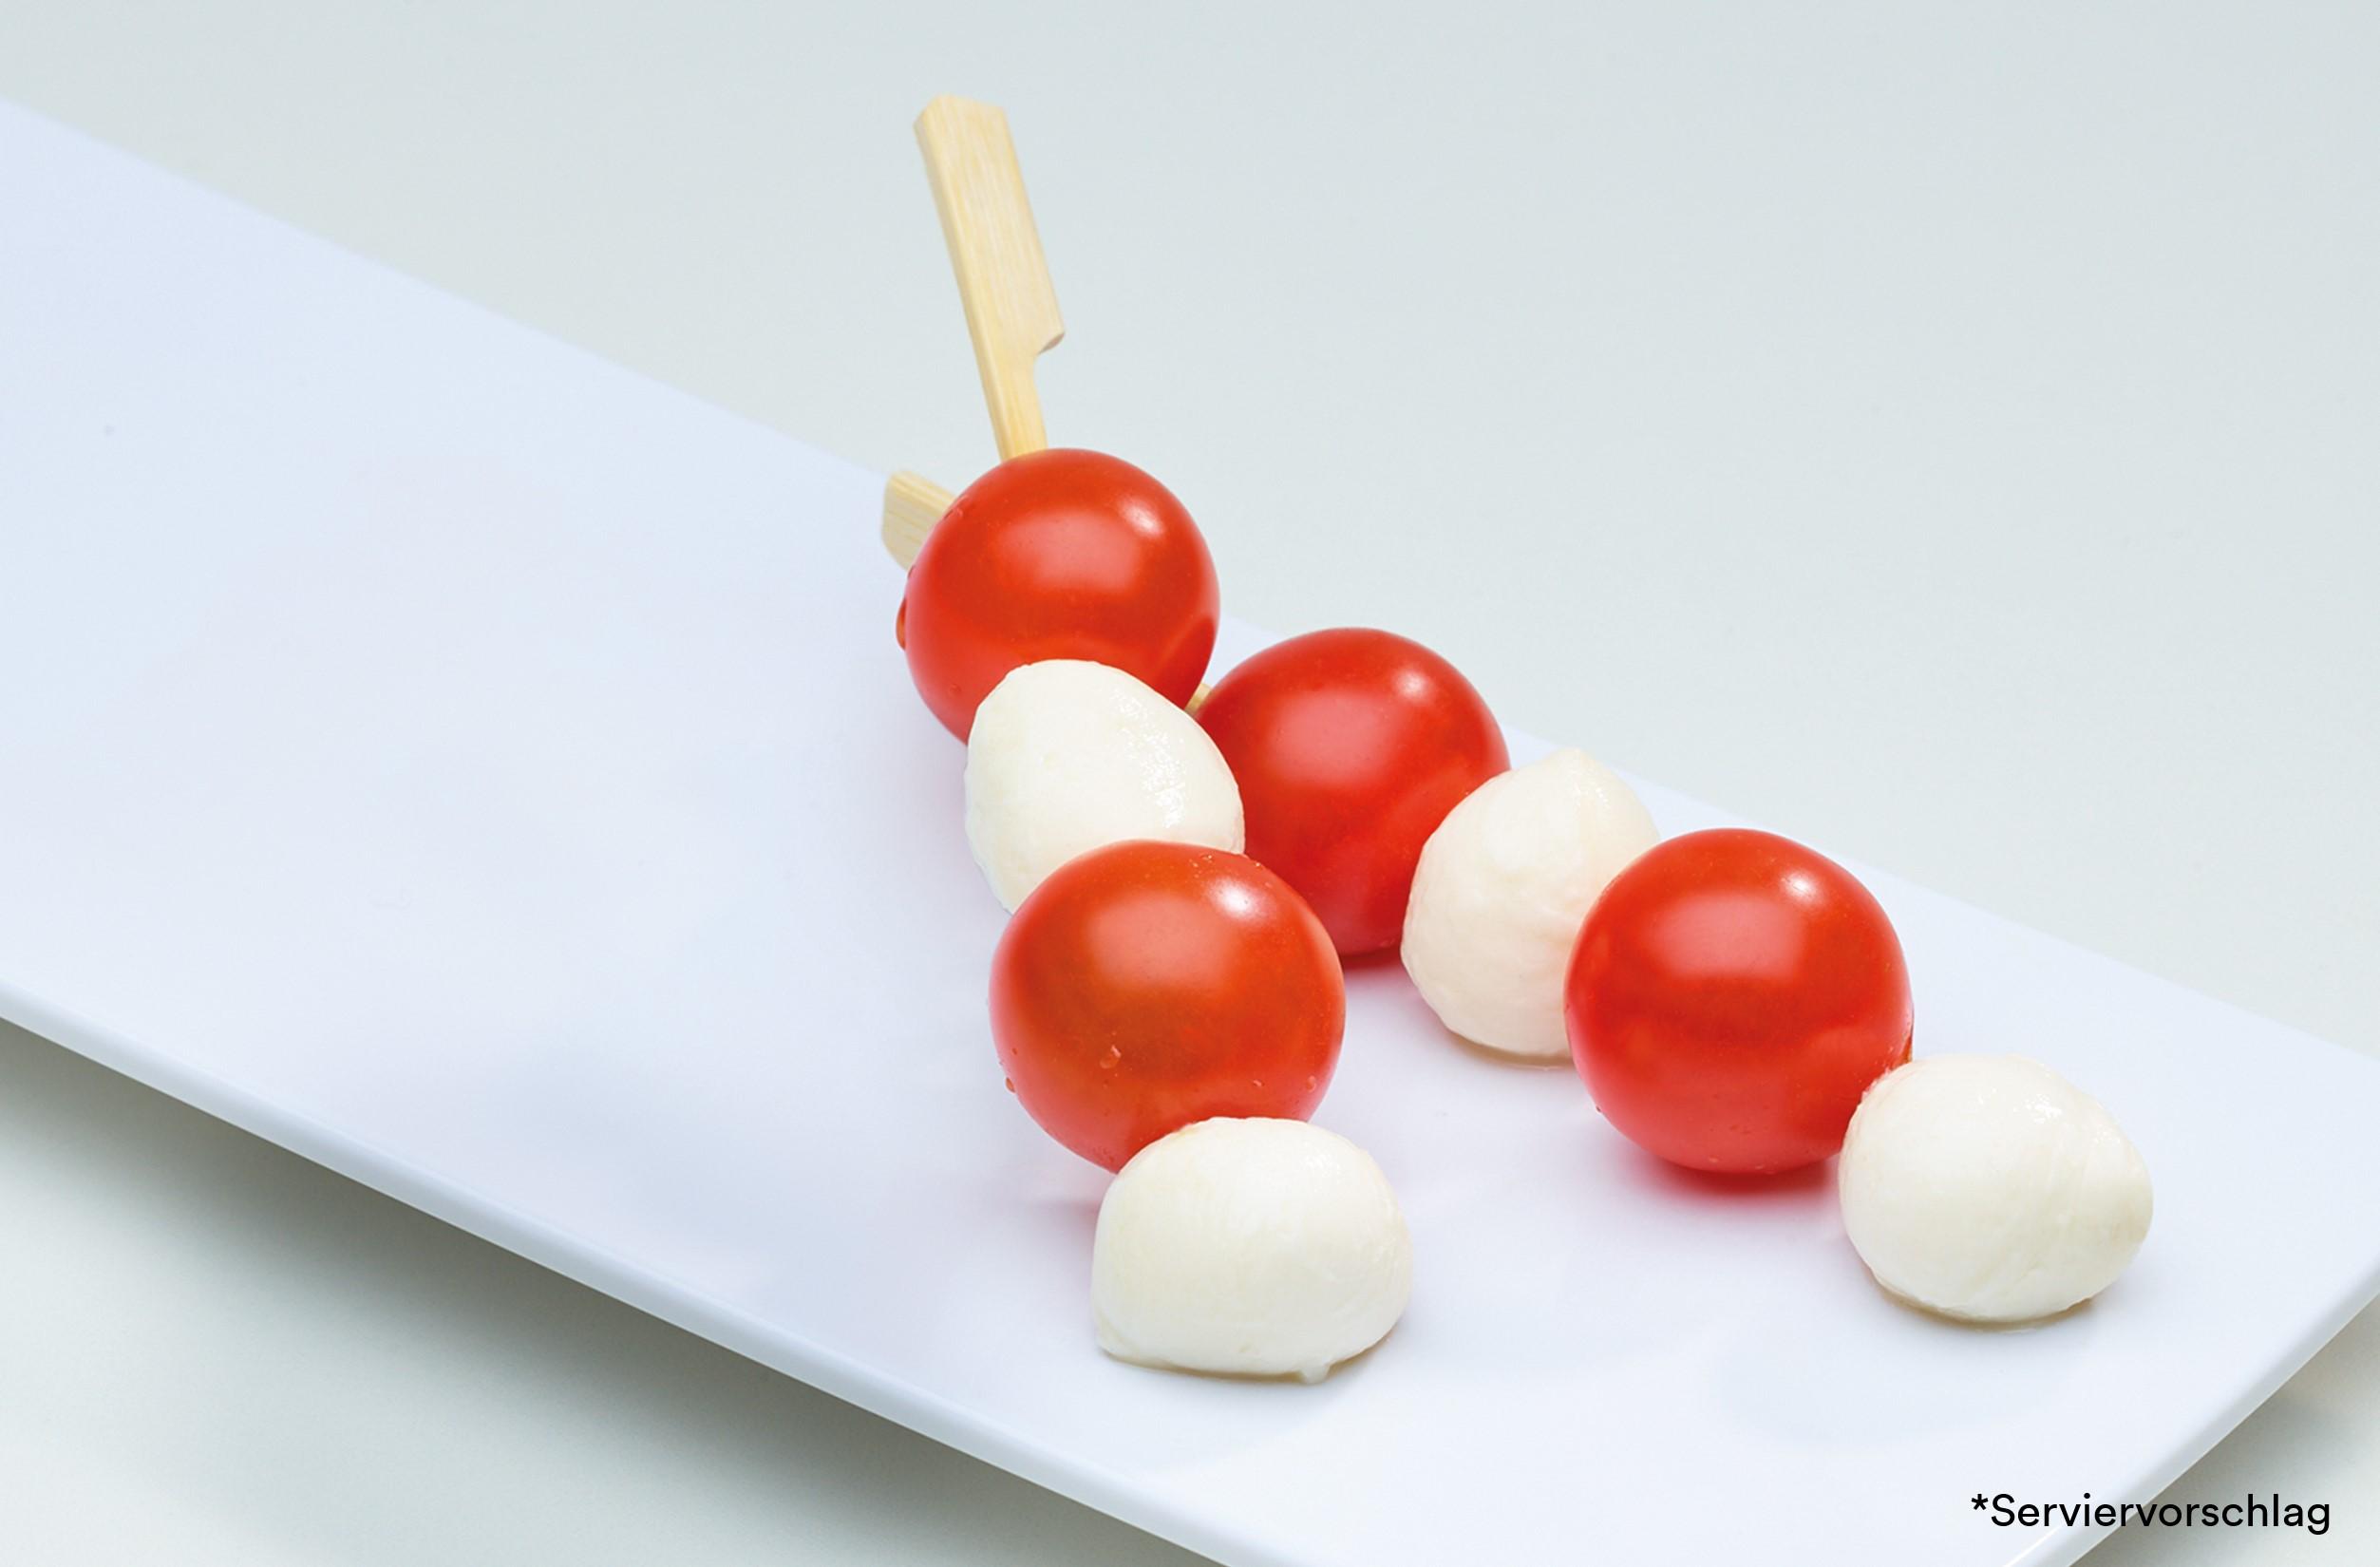 Tomaten-Mozzarella-Spieß